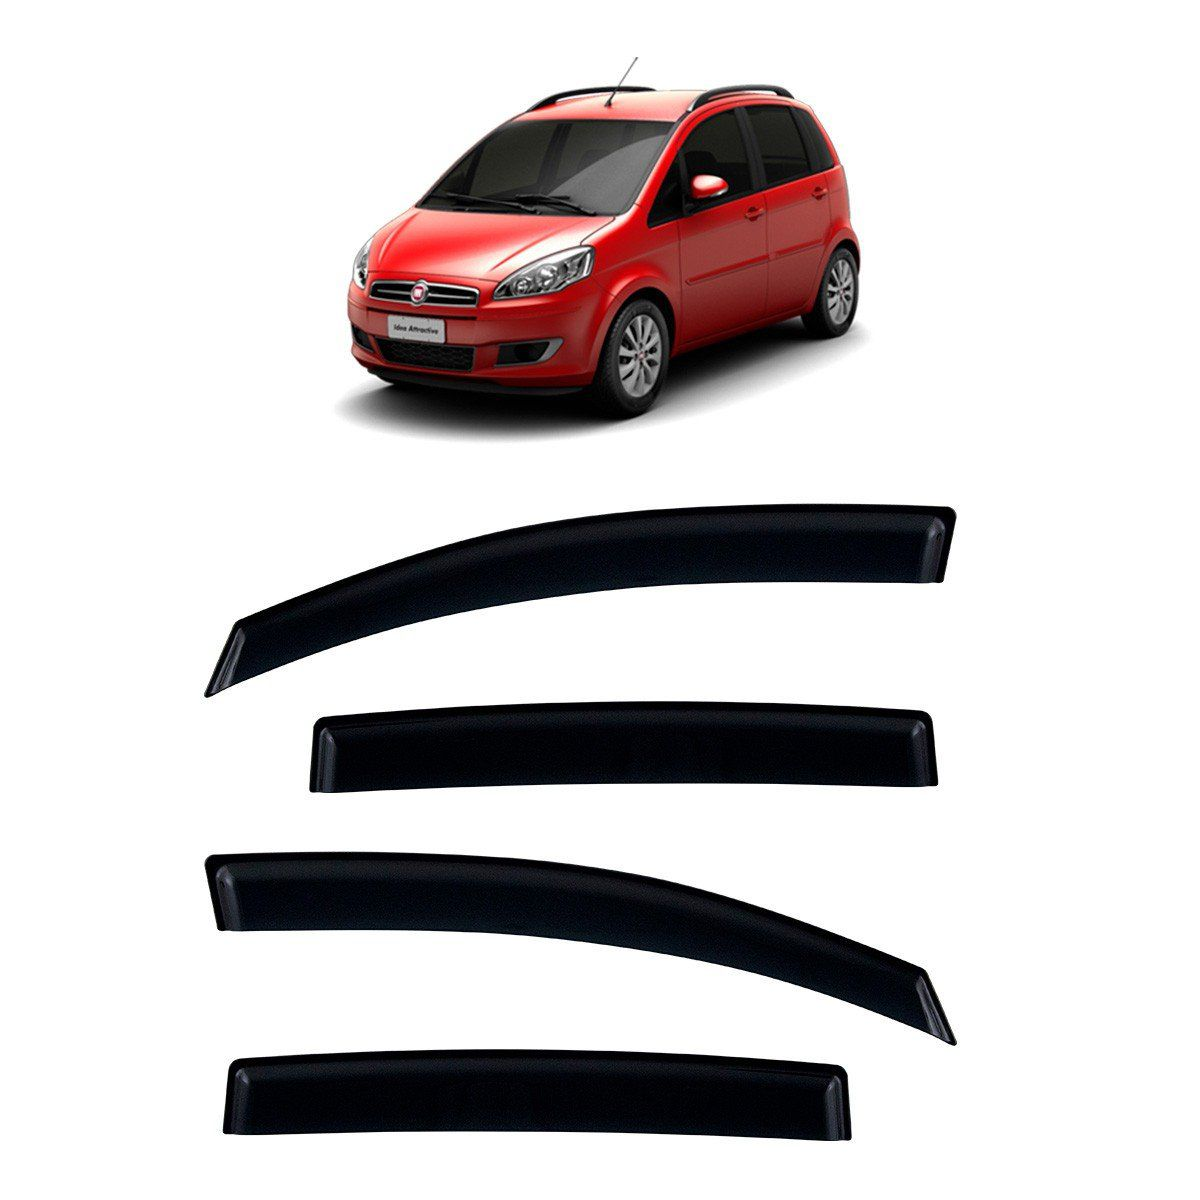 Calha De Chuva Para Fiat Idea 2005 A 2015 TG Poli